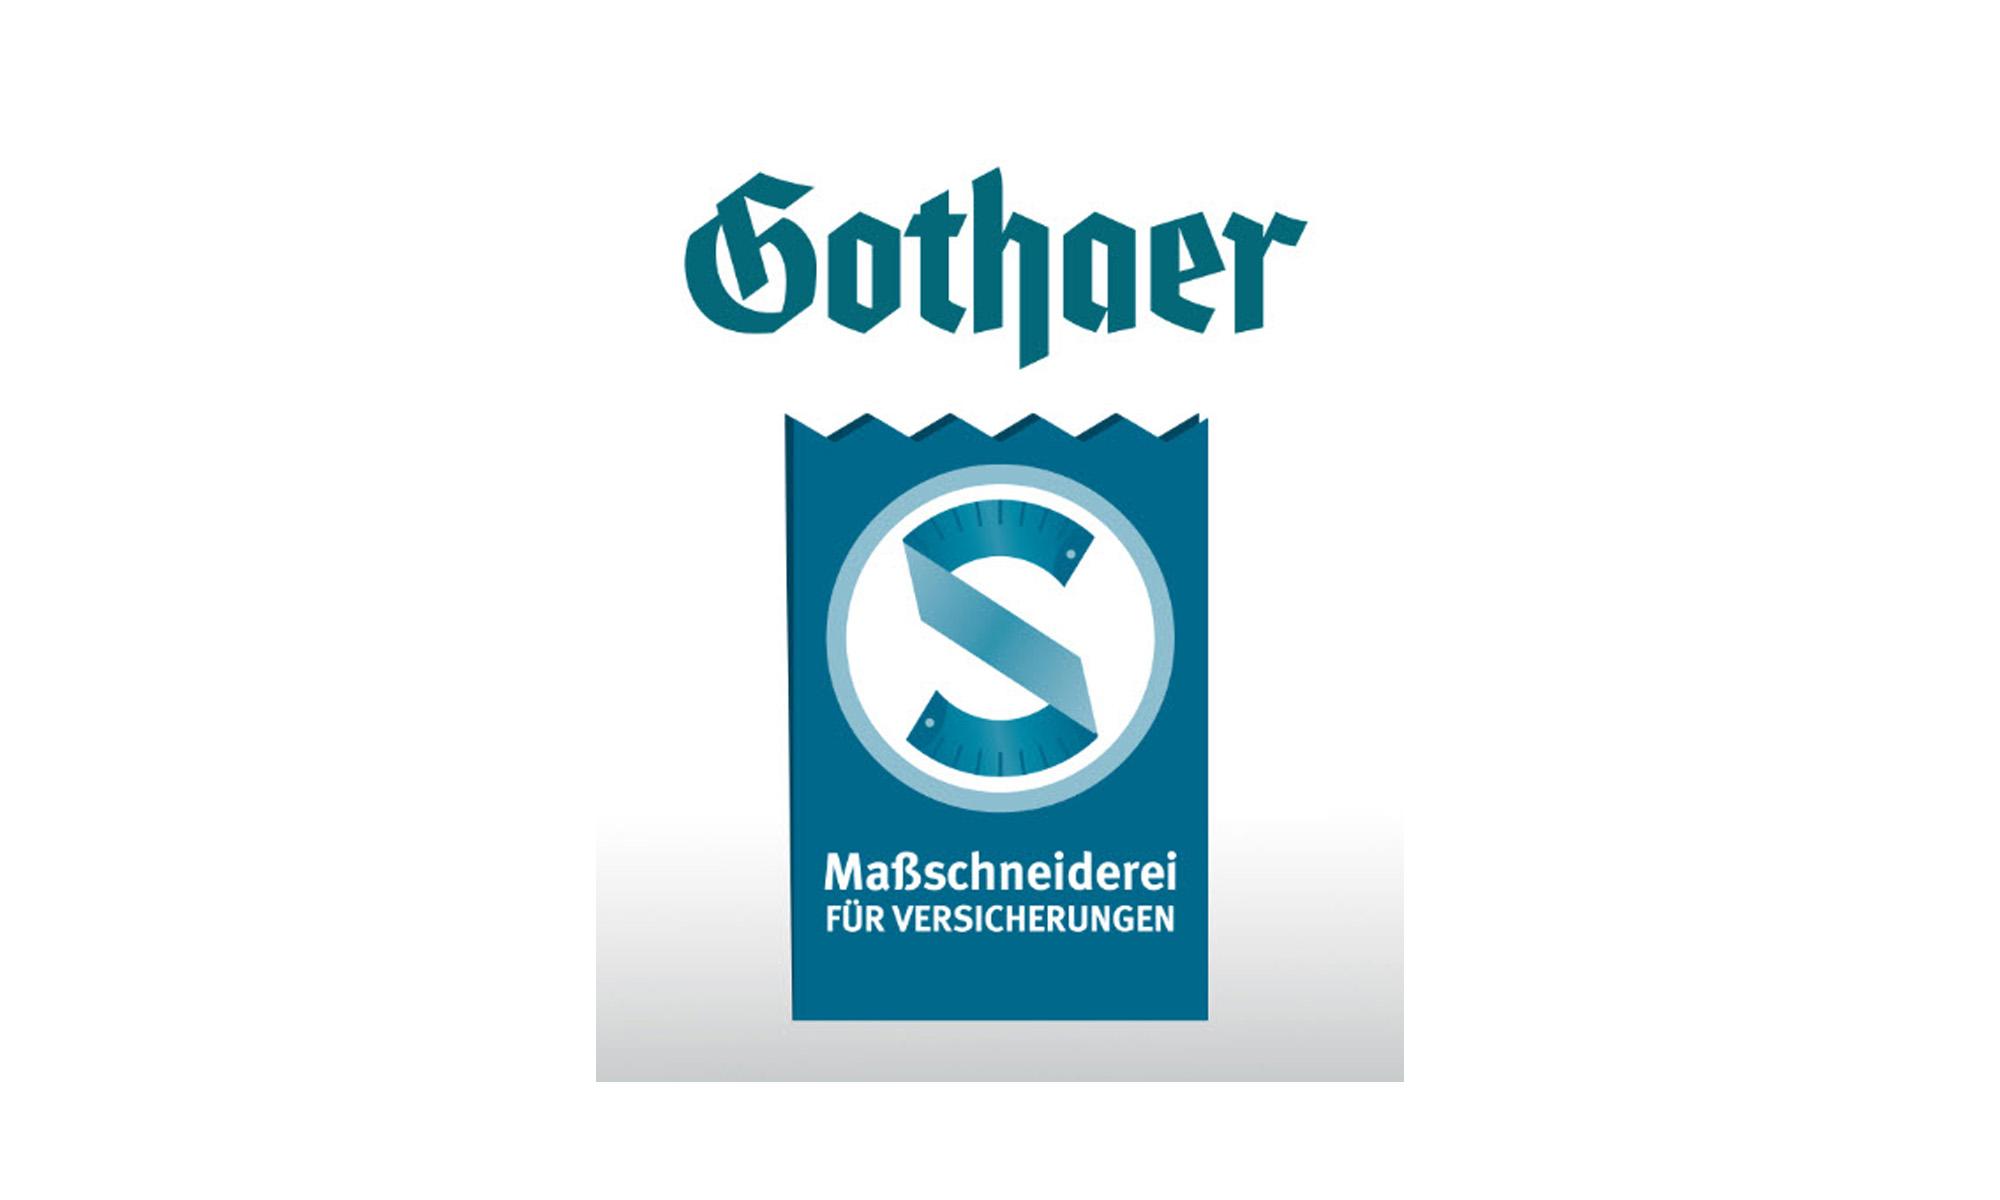 Logo fox-COURIER GmbH Leipzig